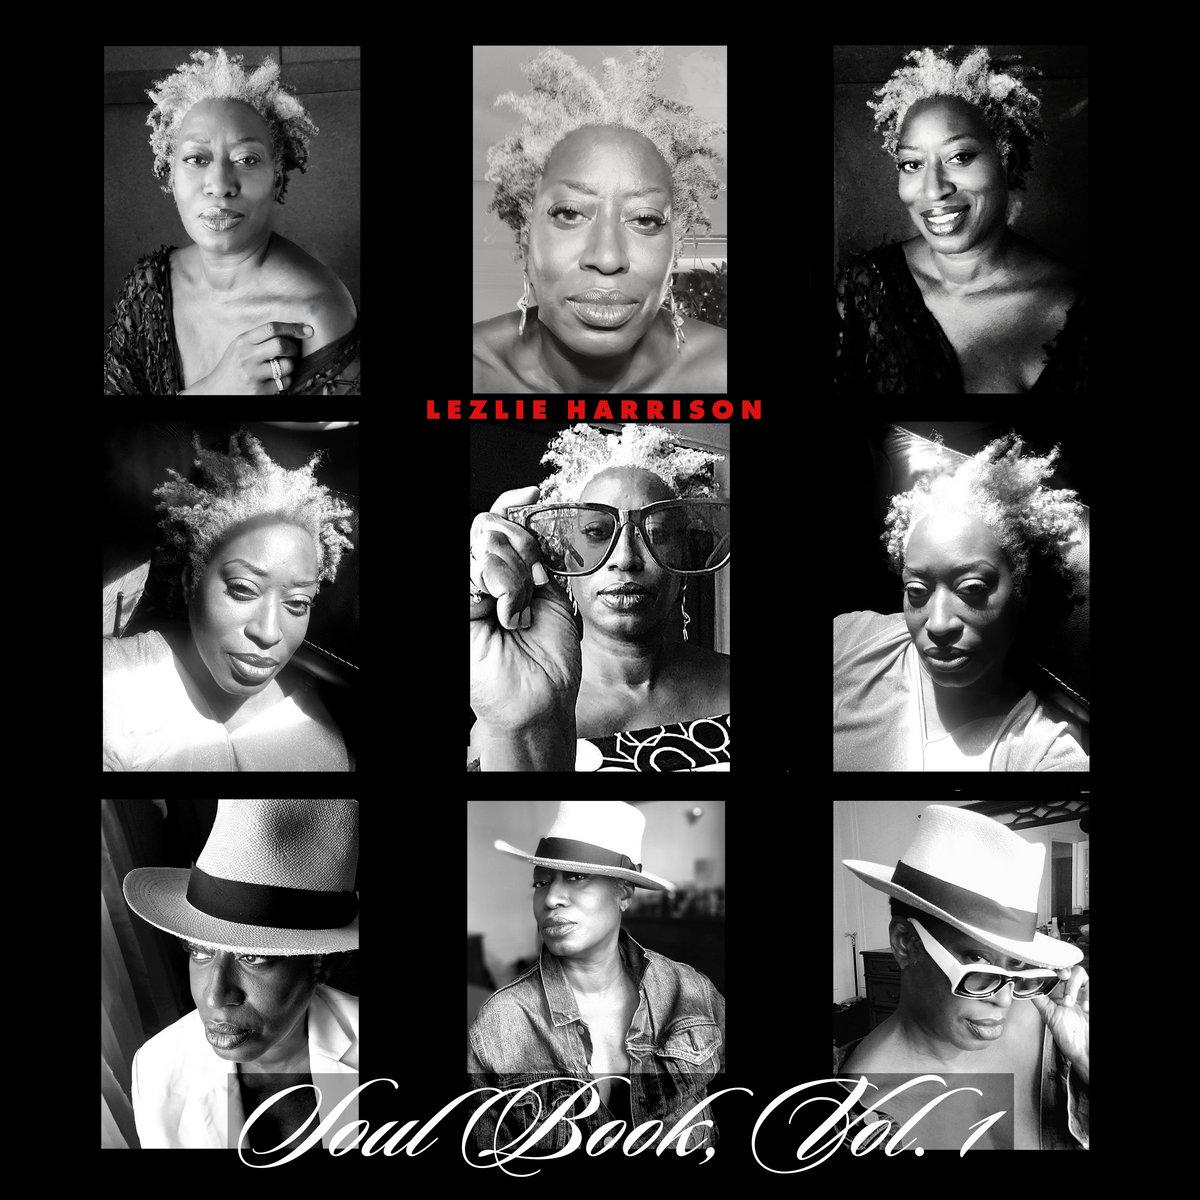 Cover Photo for Lezlie Harrison's new album Soul Book Vol. 1